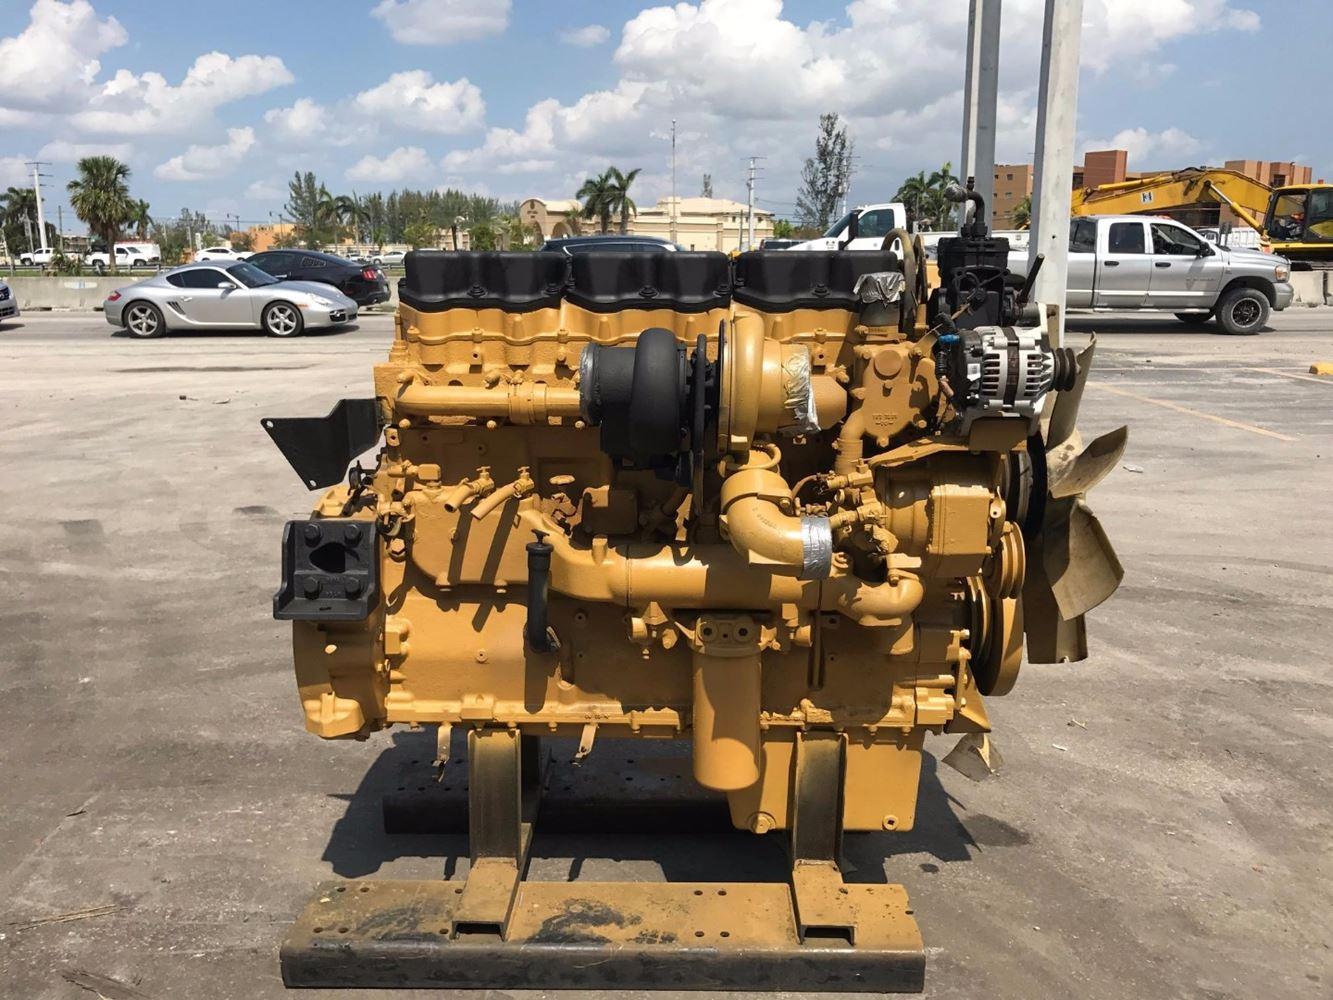 2000 Caterpillar 3406E (Stock #003493) | Engine Assys | TPI